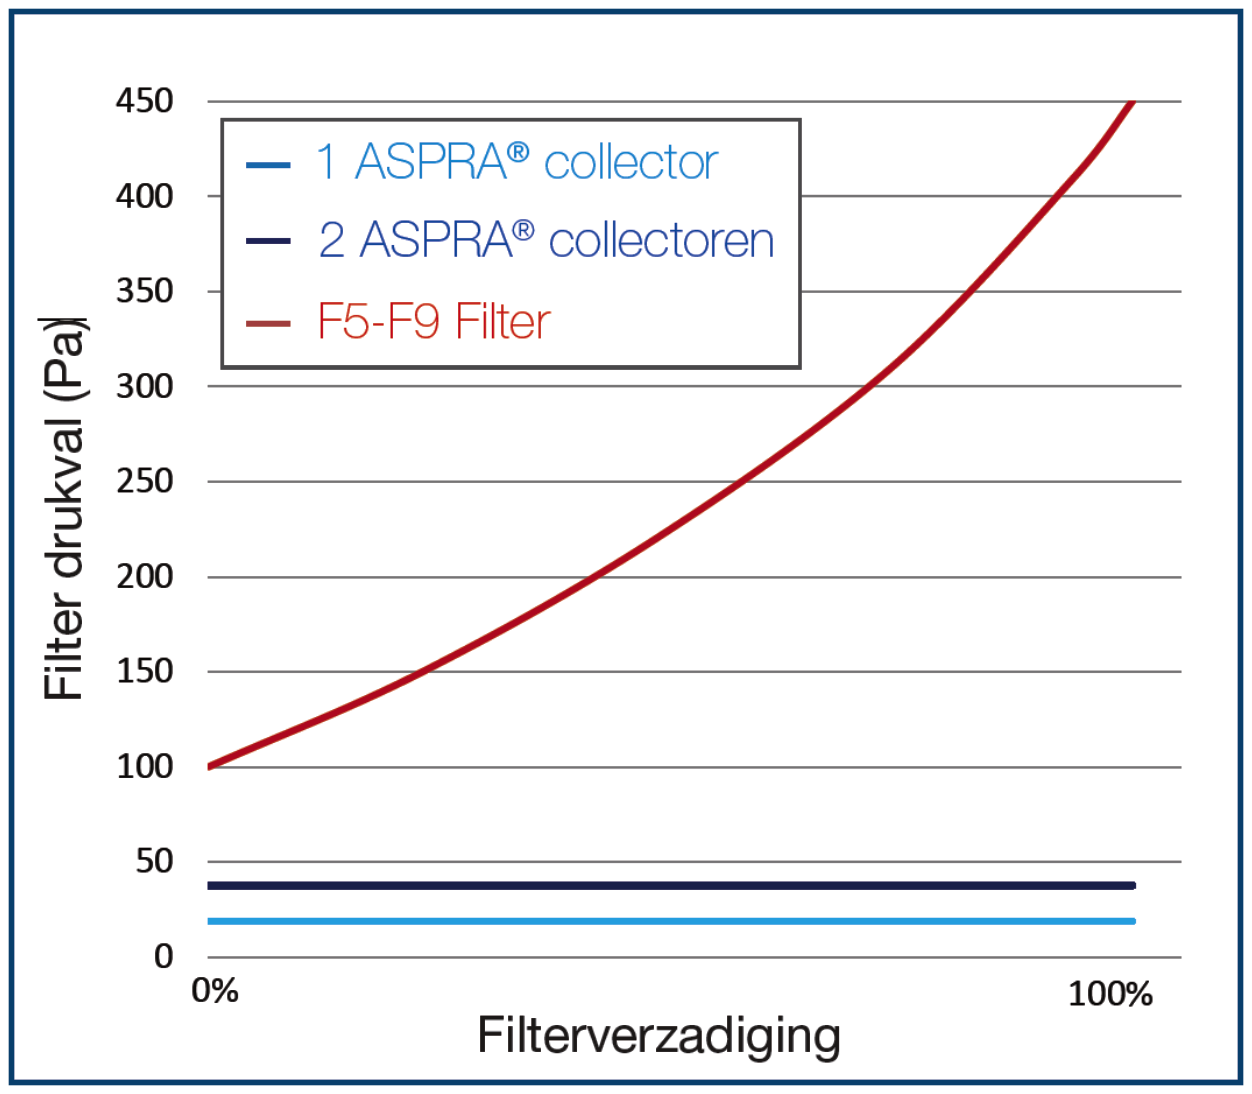 Aspra filtersaturation pronorm air